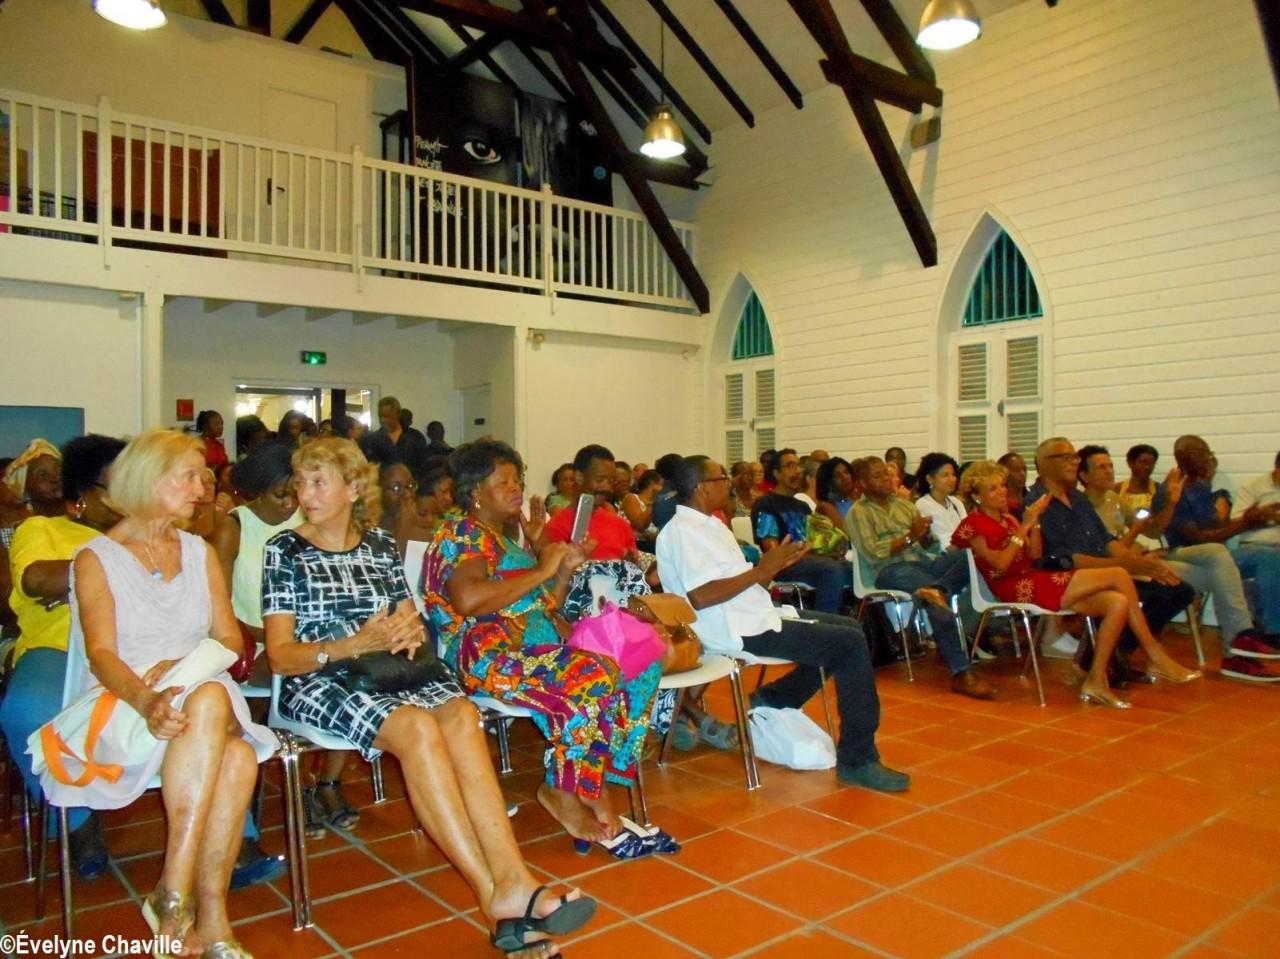 The 11th Festival International du Zouk is opened - Kariculture